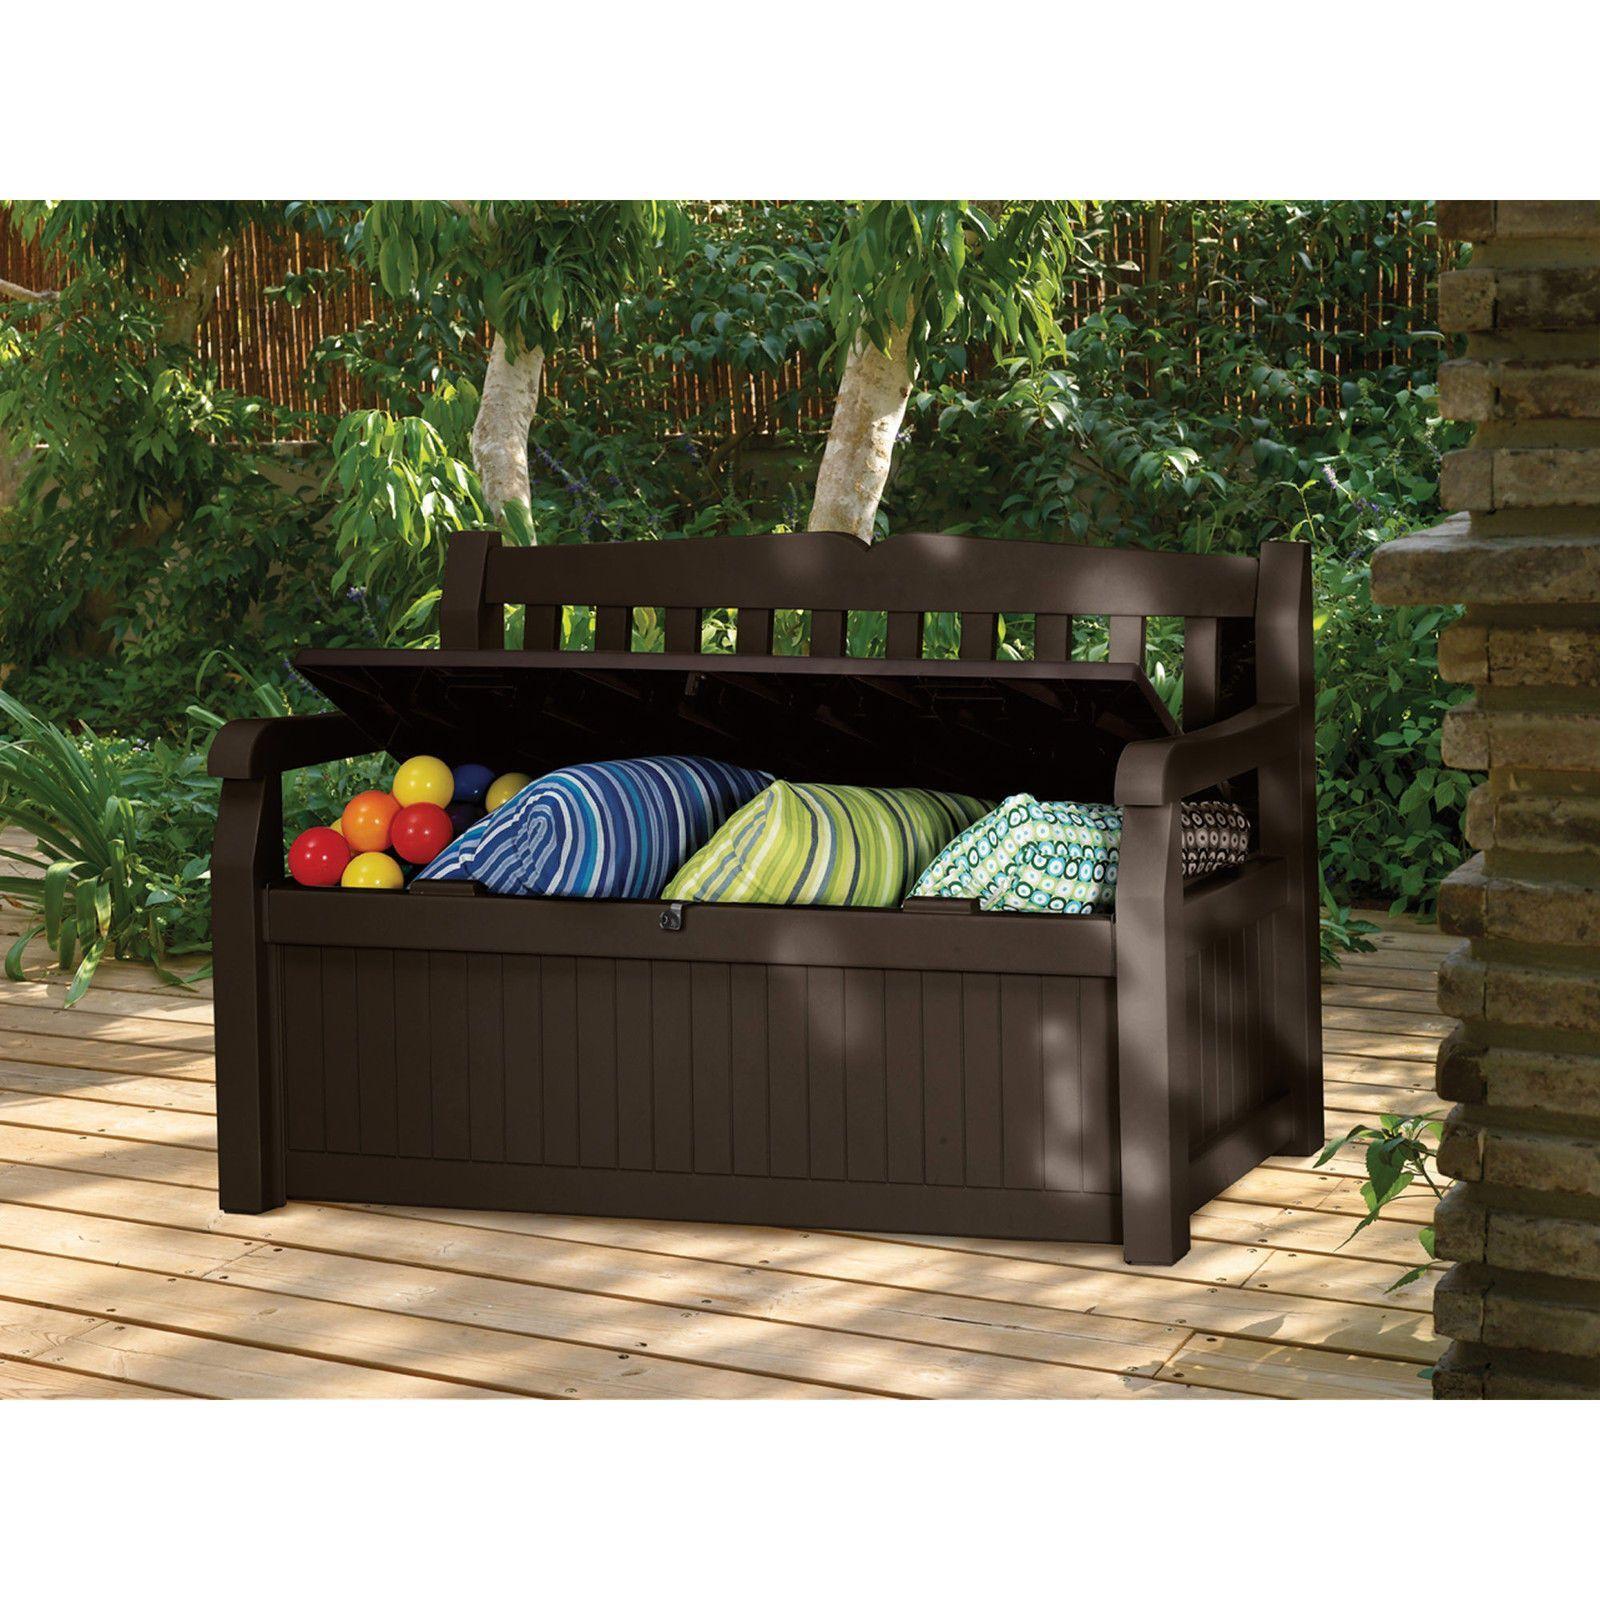 Remarkable Keter Eden Outdoor Seating Storage Box 70 Gal Patio Deck Creativecarmelina Interior Chair Design Creativecarmelinacom